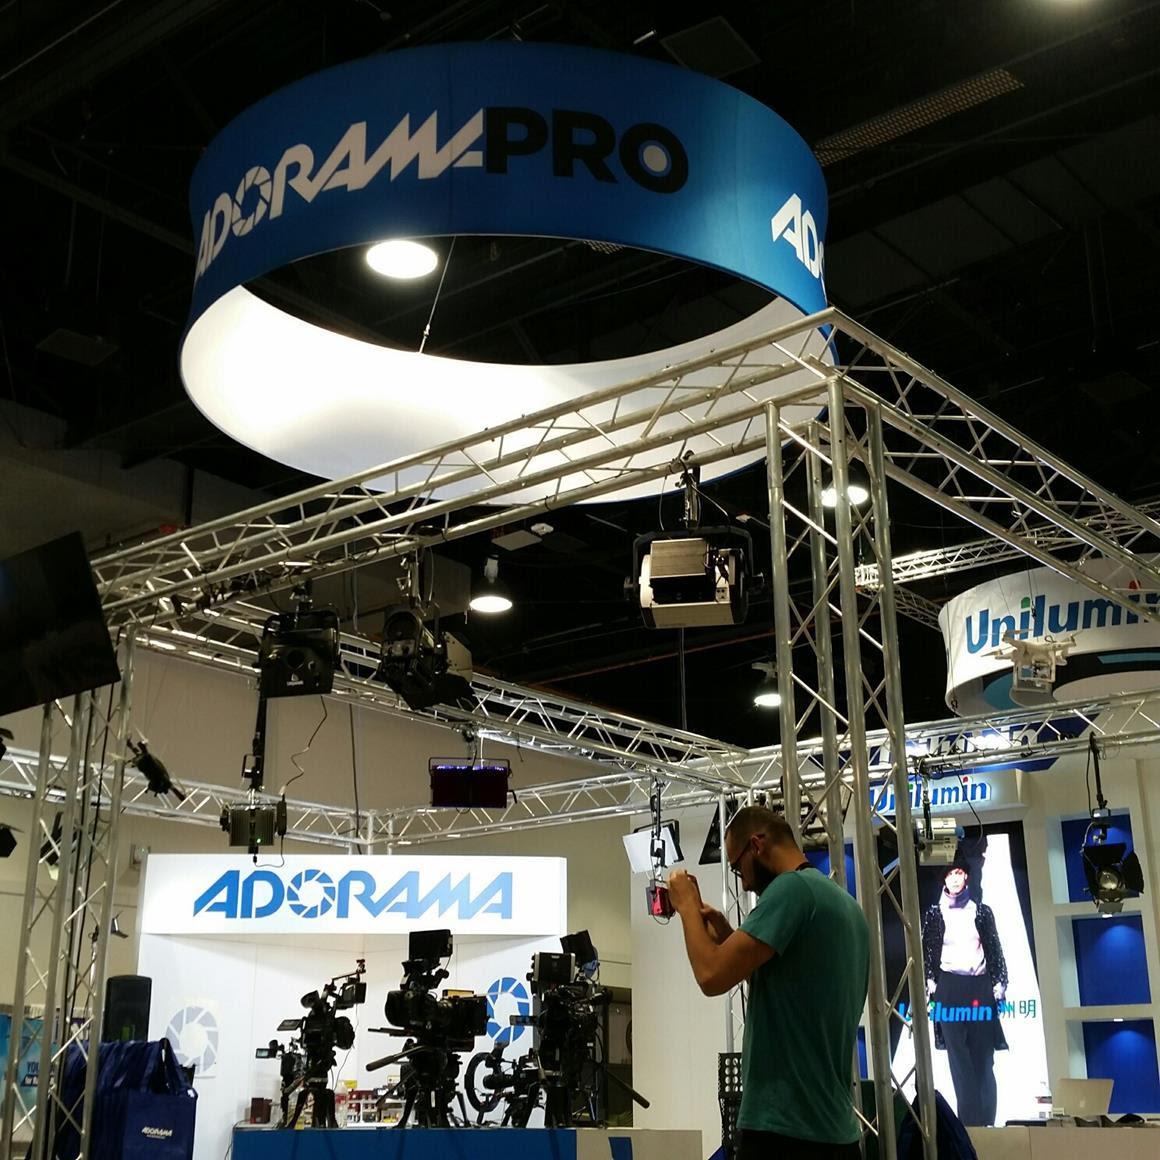 Adorama-nab 2017   Technology News 2017